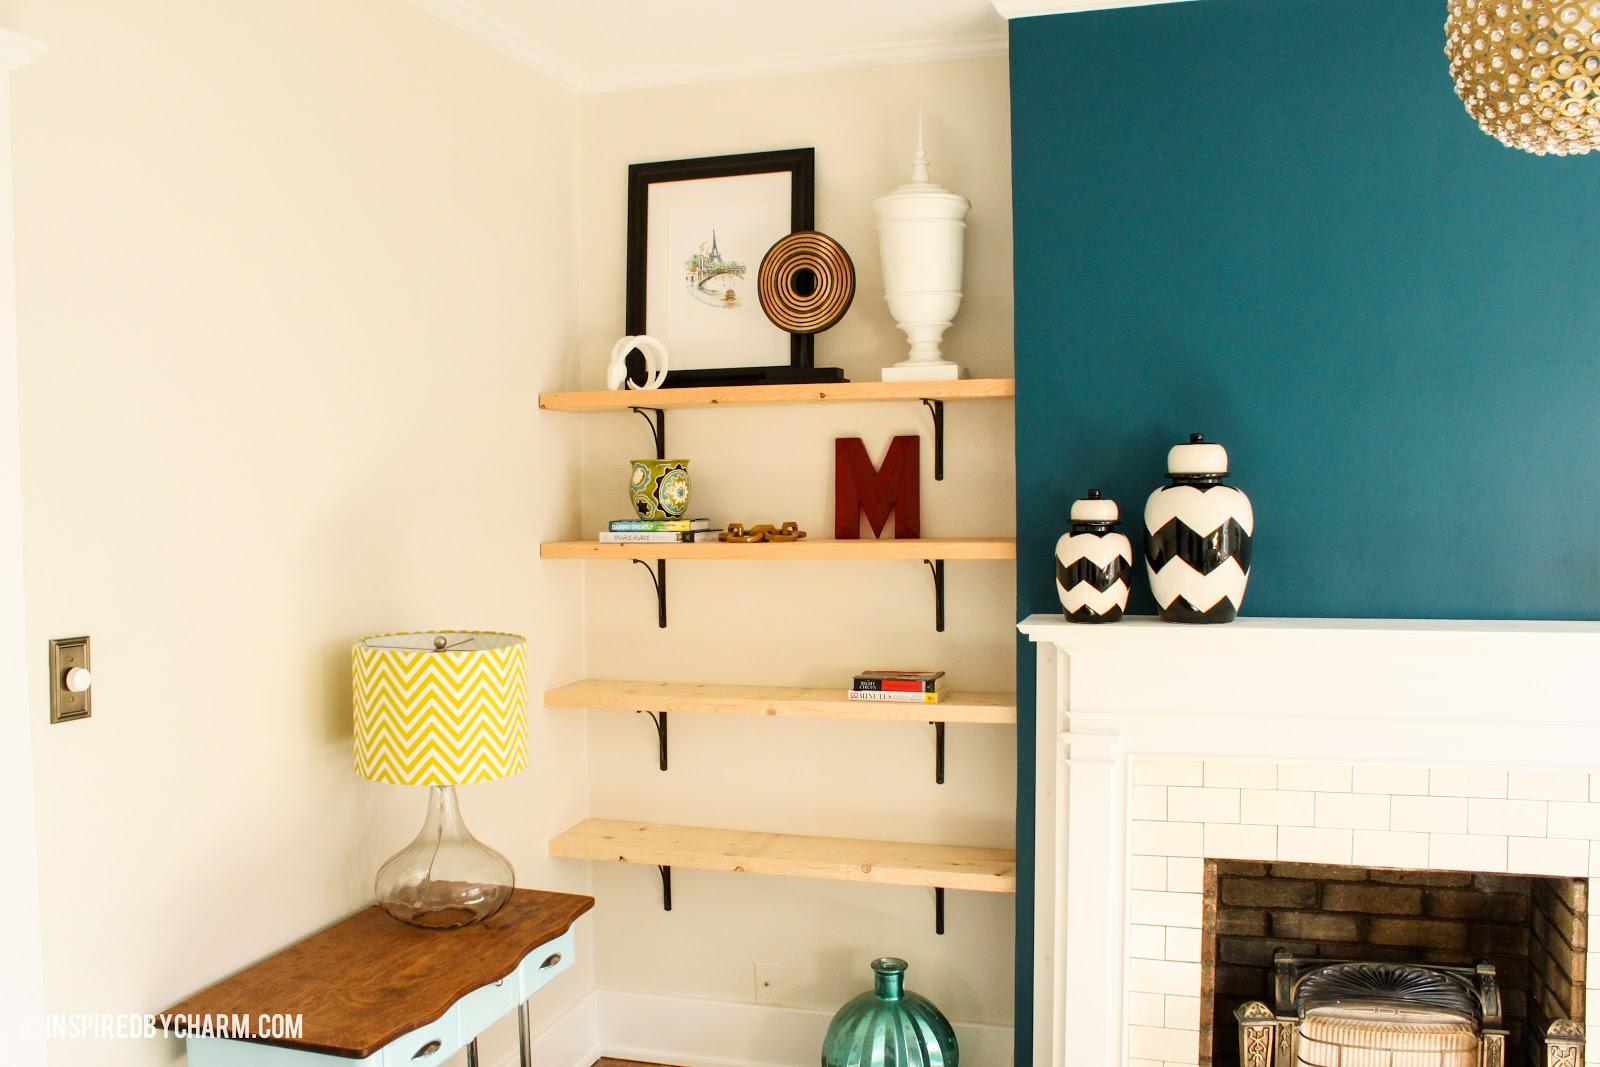 Shelves, Cat Yoga, and Tchotchkes